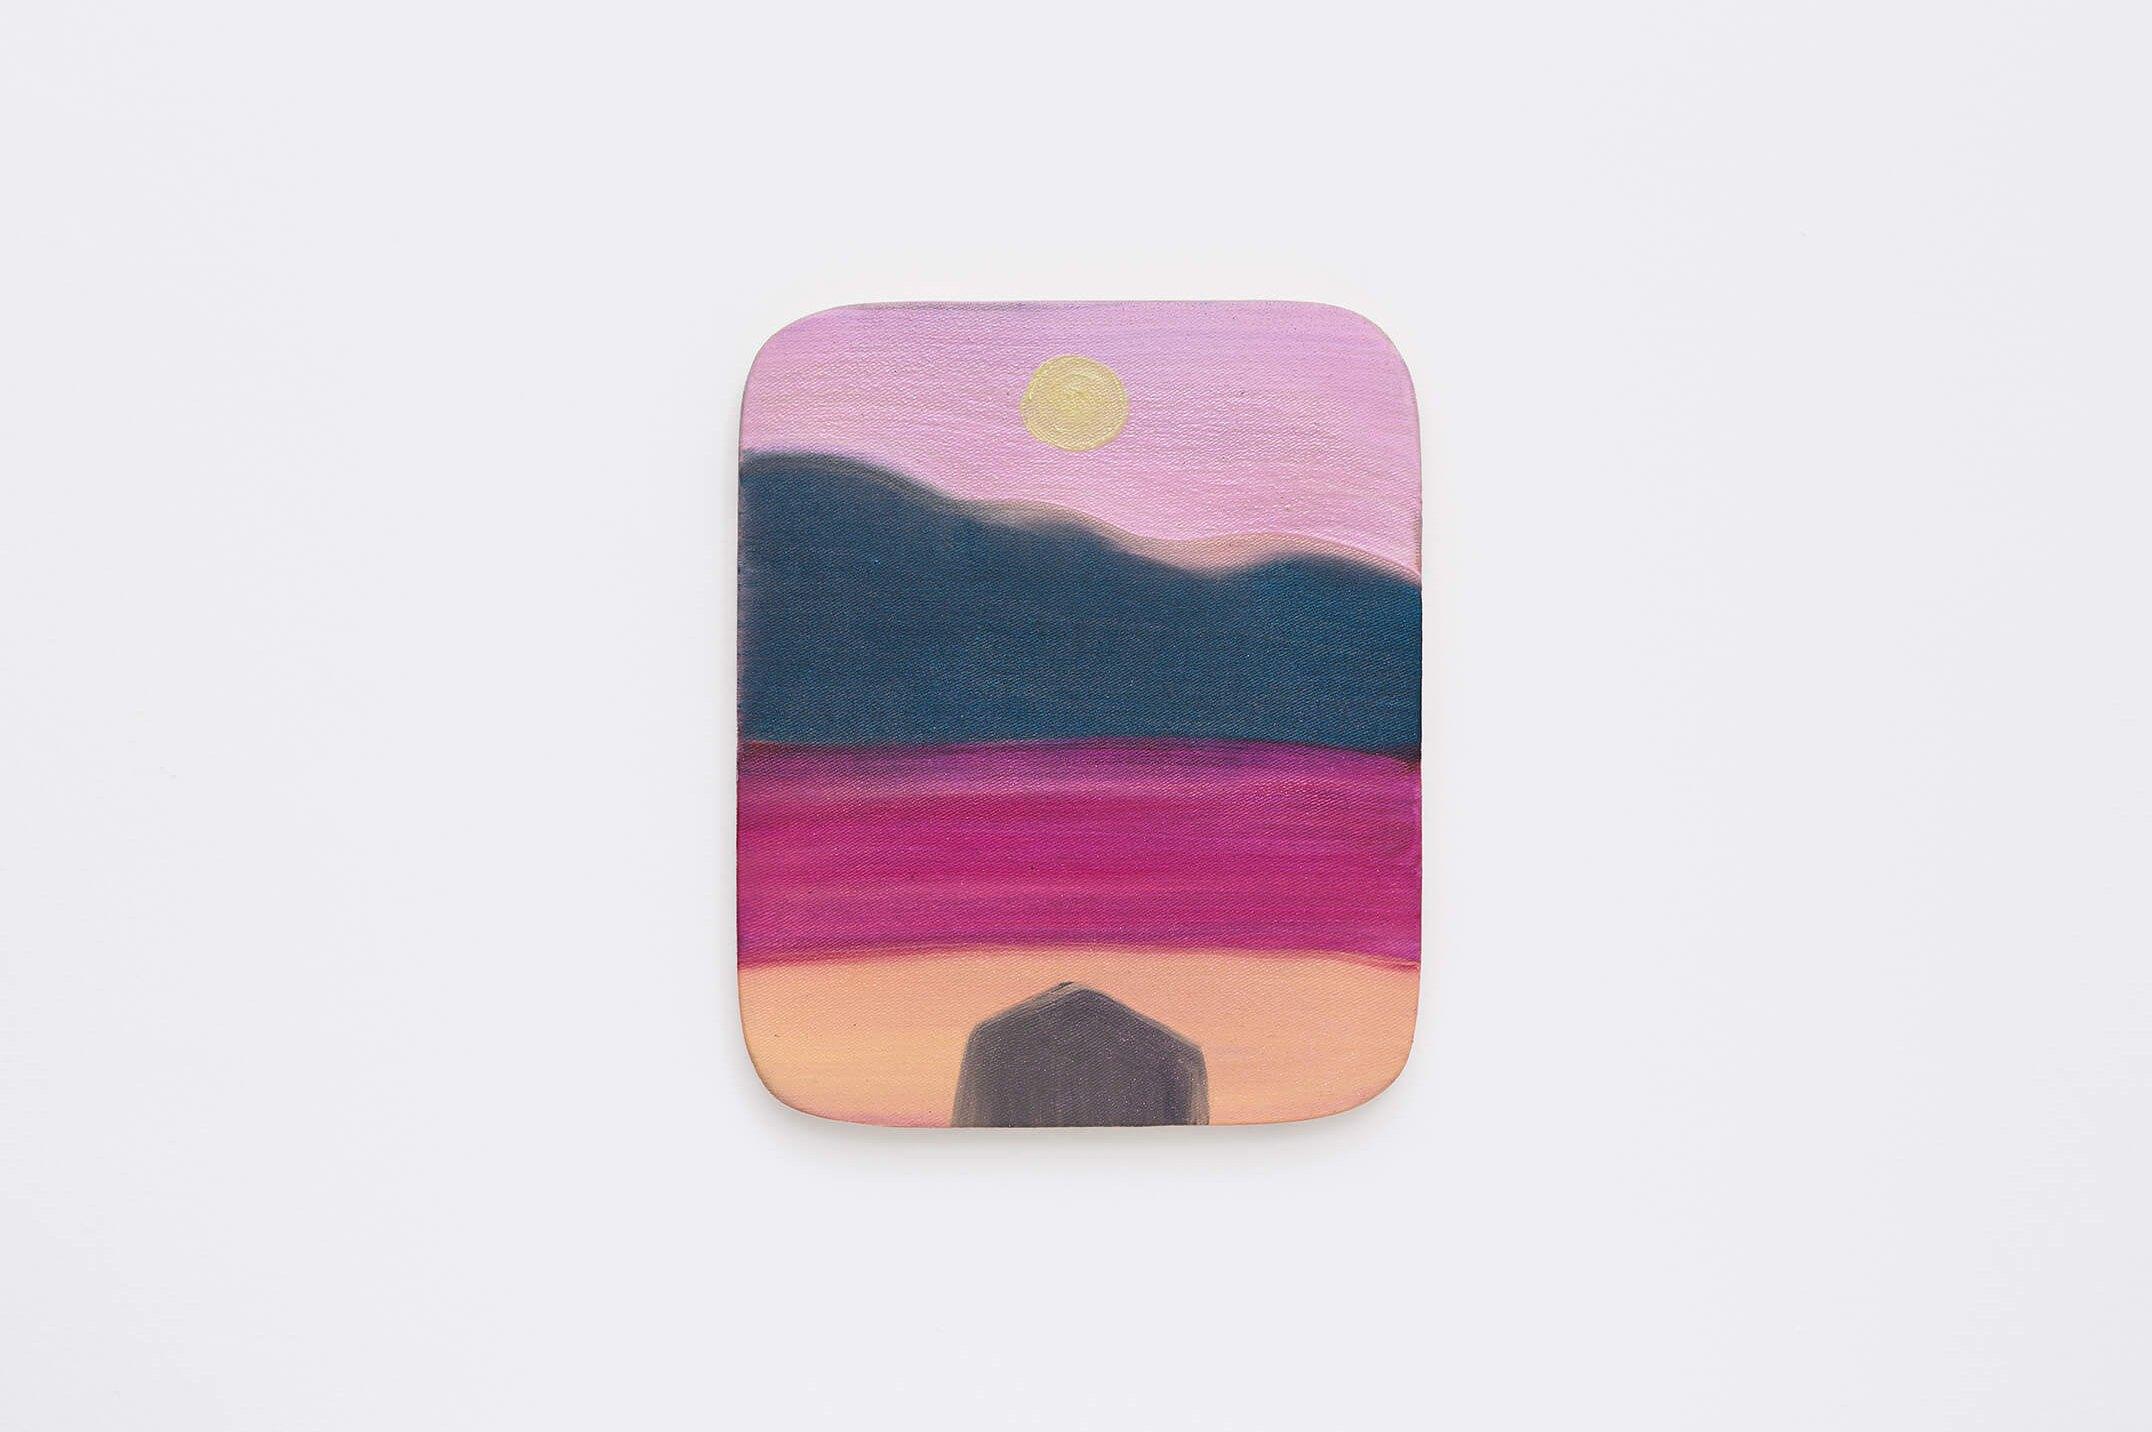 Marina Perez Simão,<em>untitled</em>,2015,oil and iridescent pigment on canvas, 29 × 24,5 ×2 cm - Mendes Wood DM